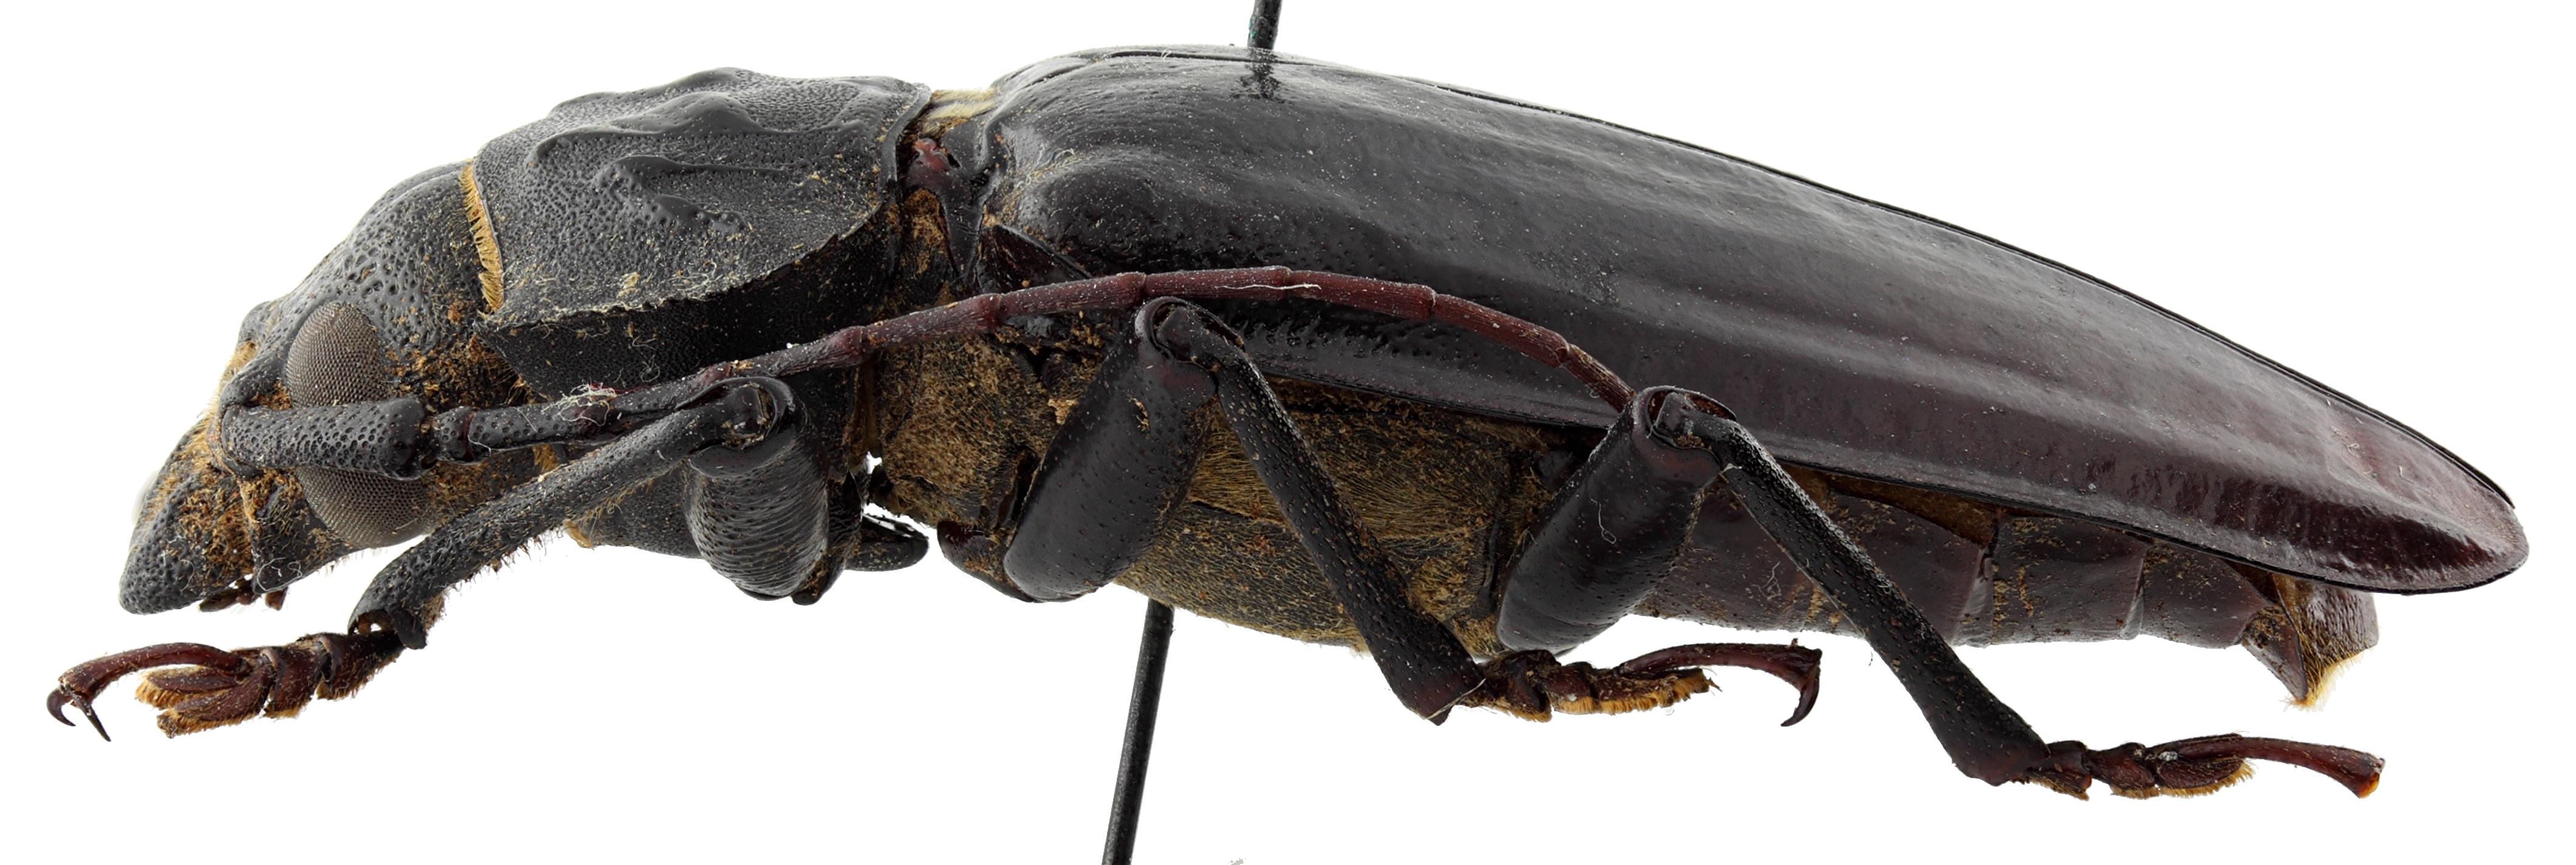 Olethrius laevipennis 01 BL Holotype M 056 BRUS 201405.jpg